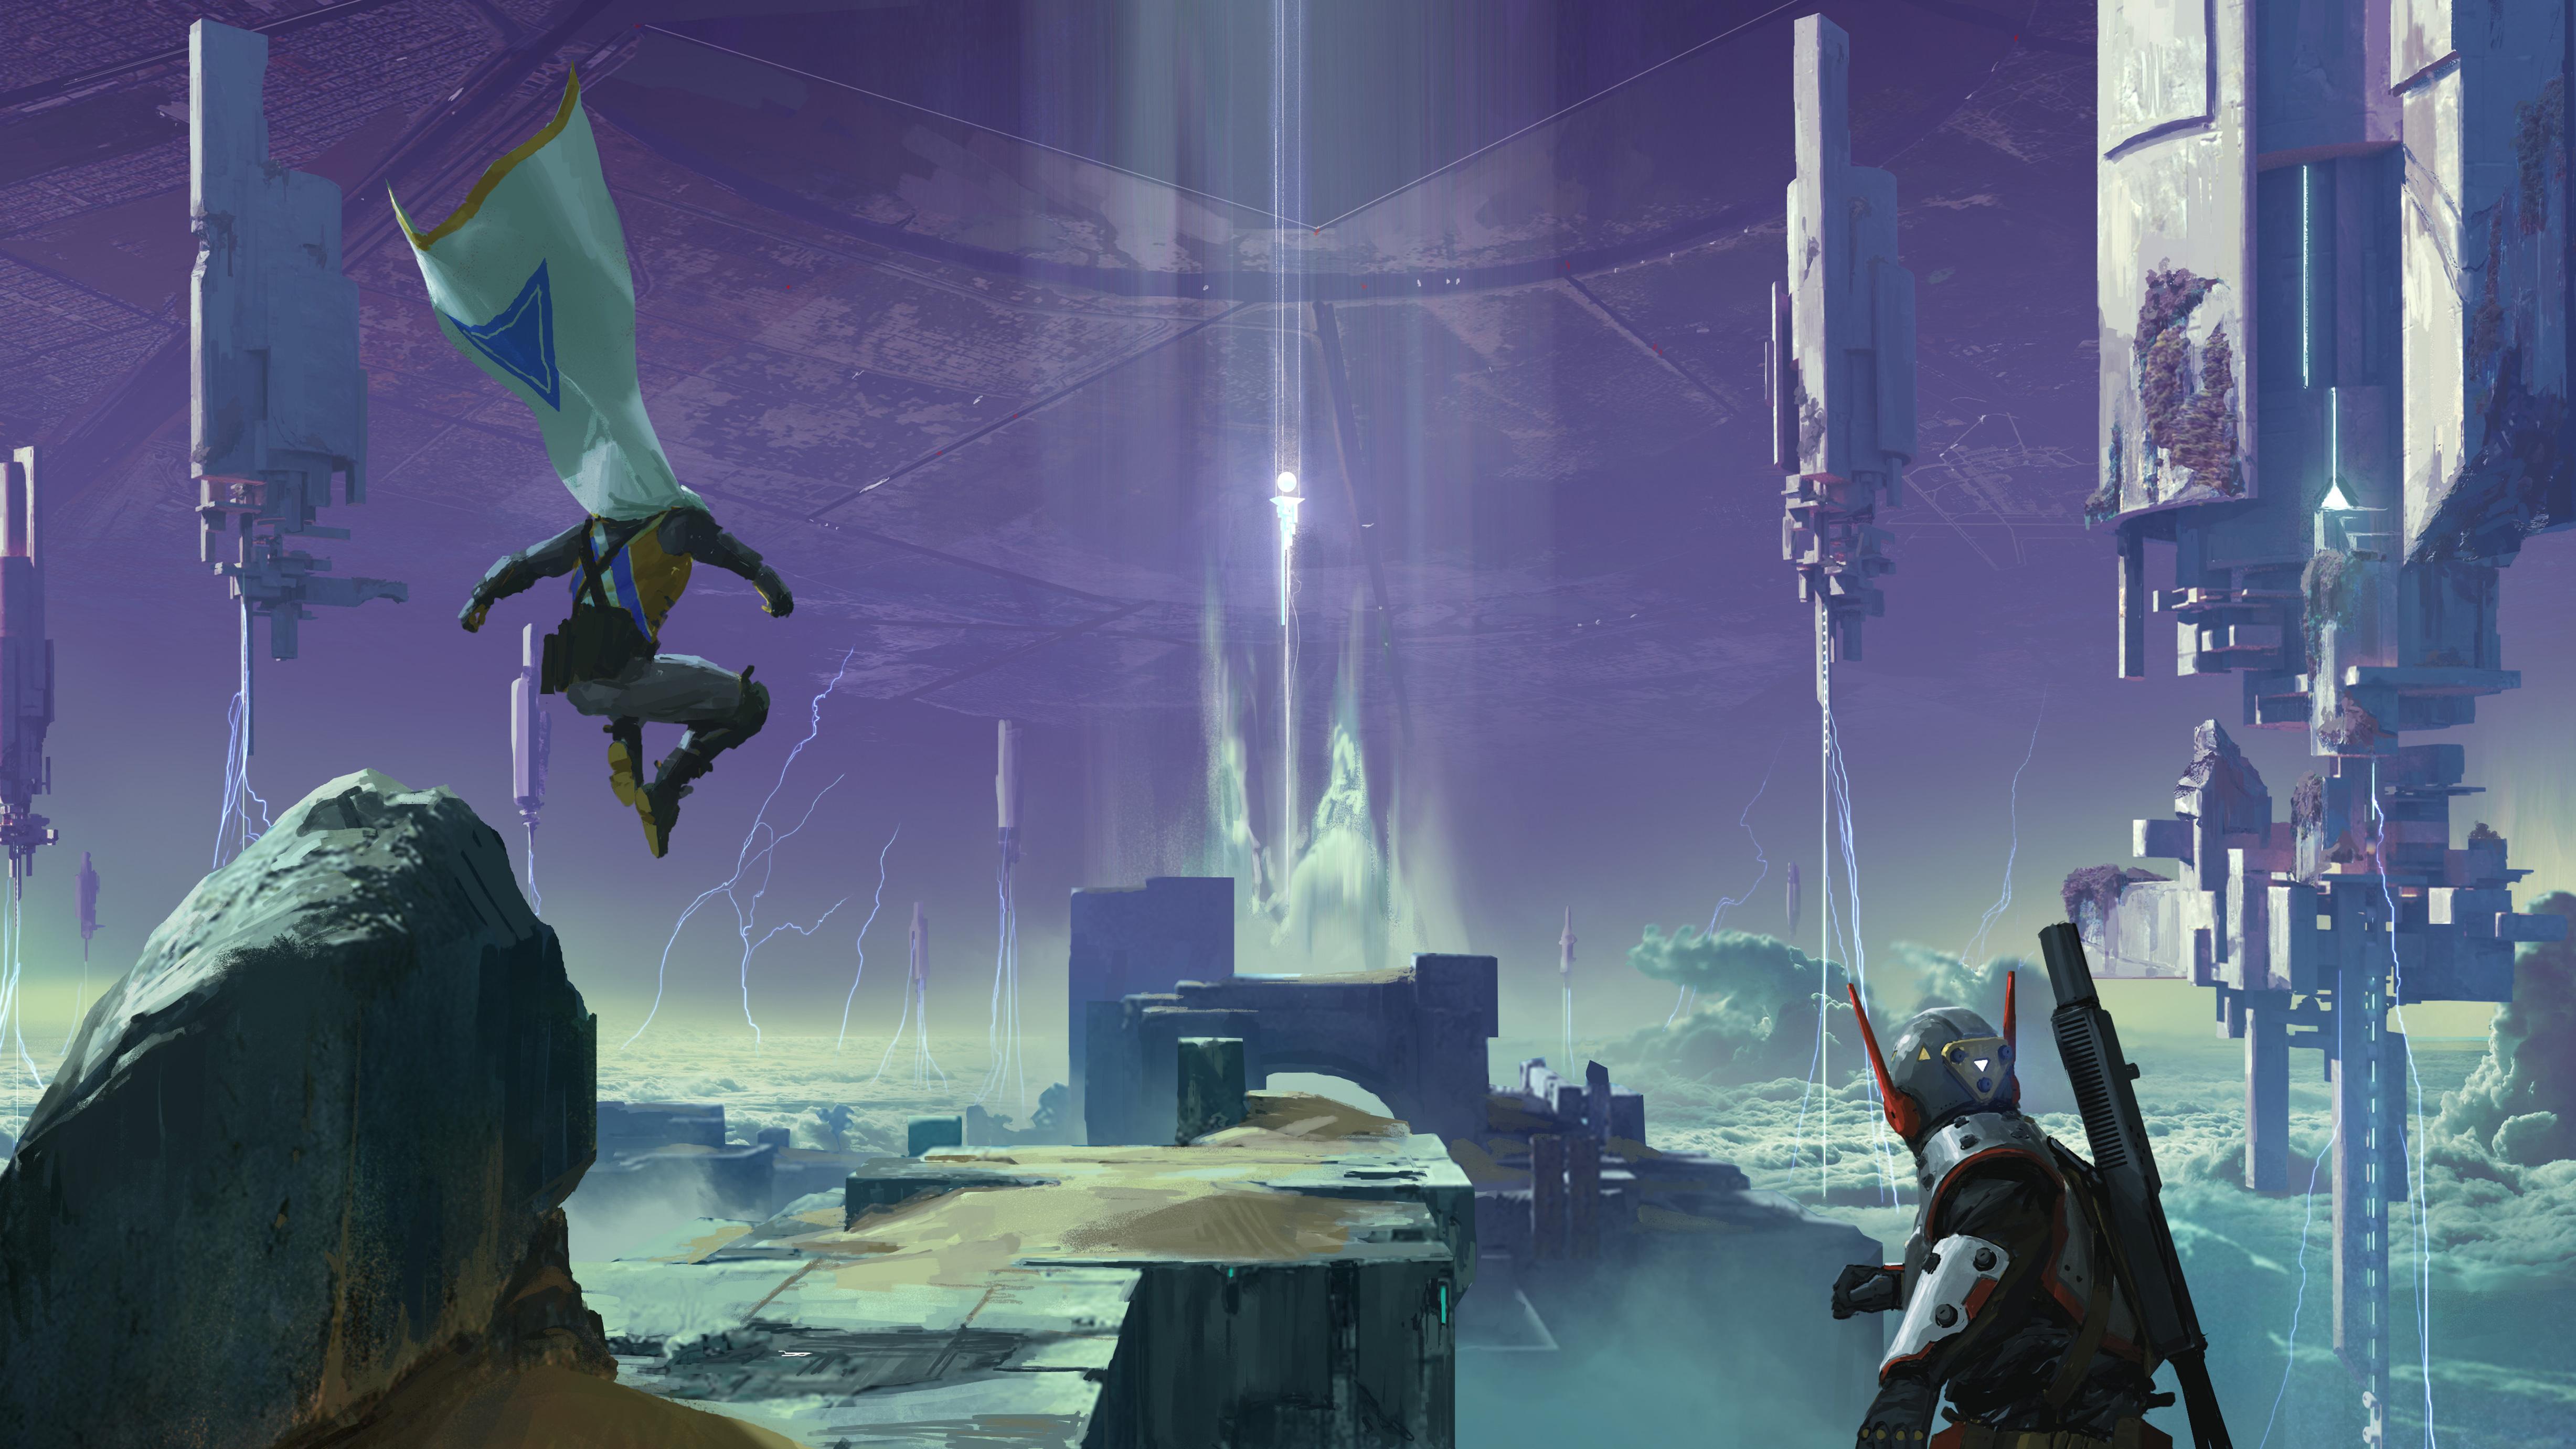 Destiny 2 Concept Art 5k, HD Games, 4k Wallpapers, Images